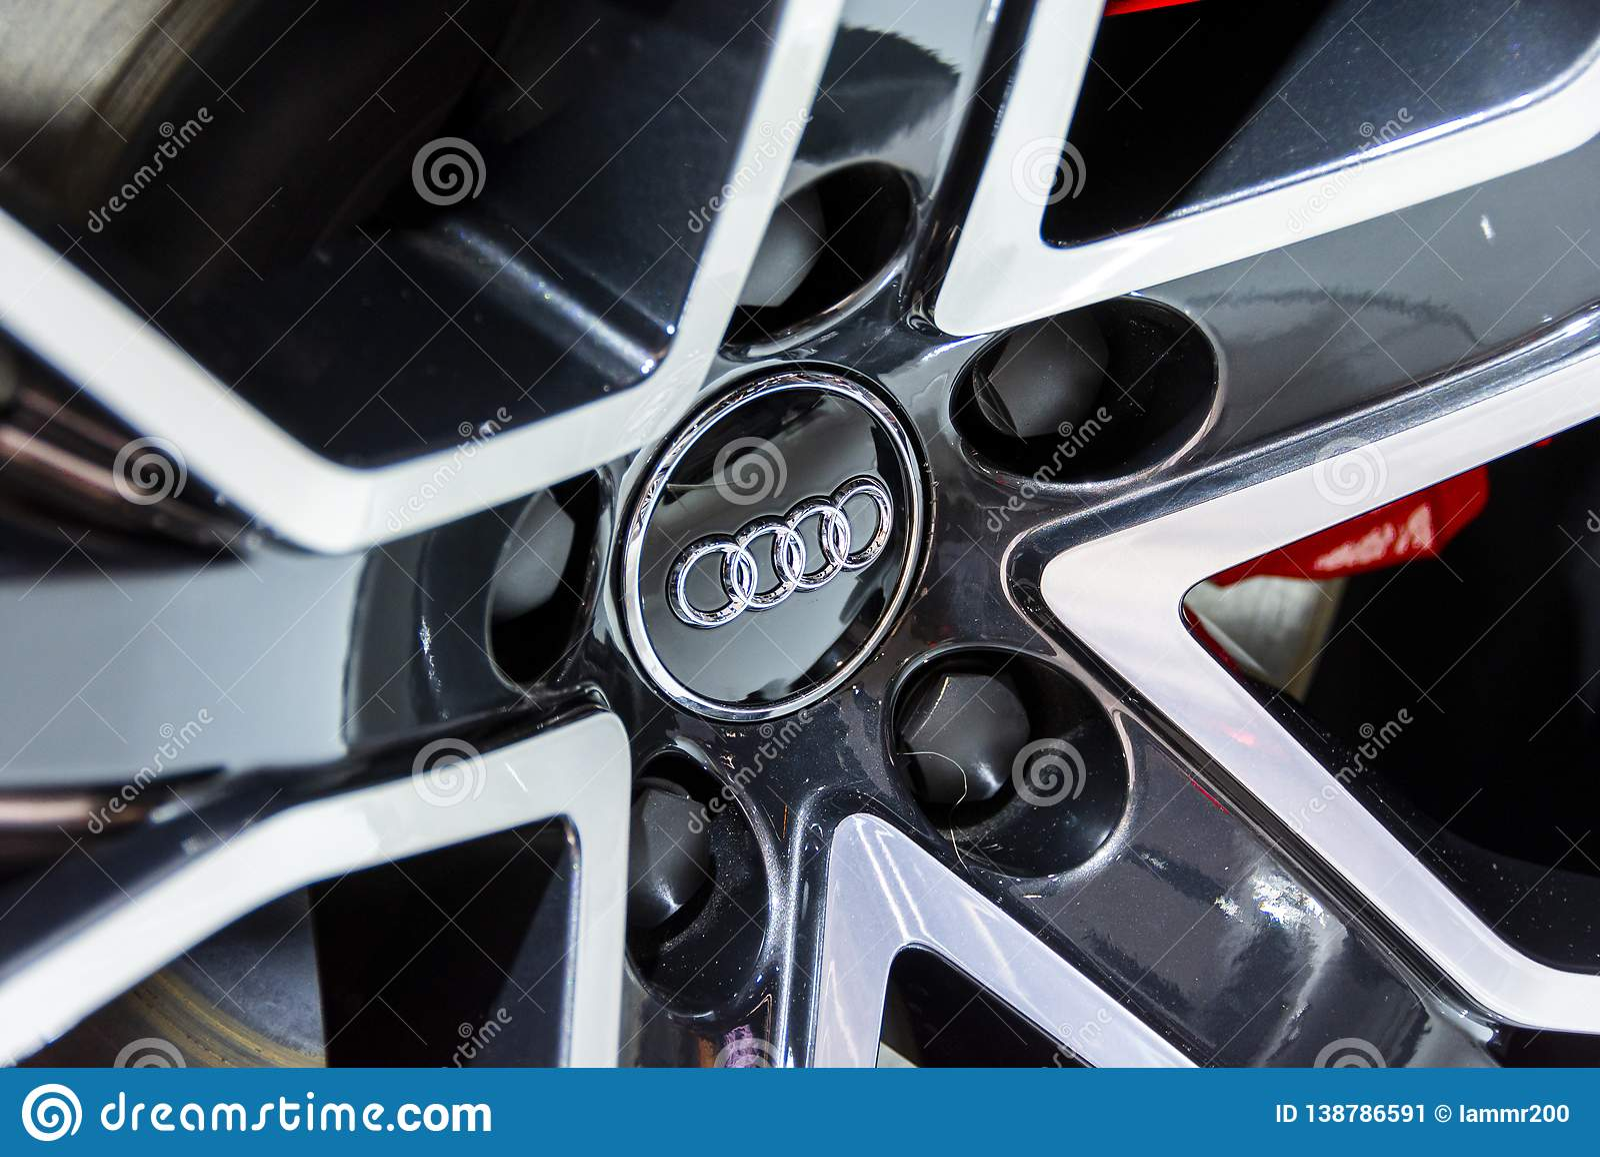 Audi emblemat na aliażu kole